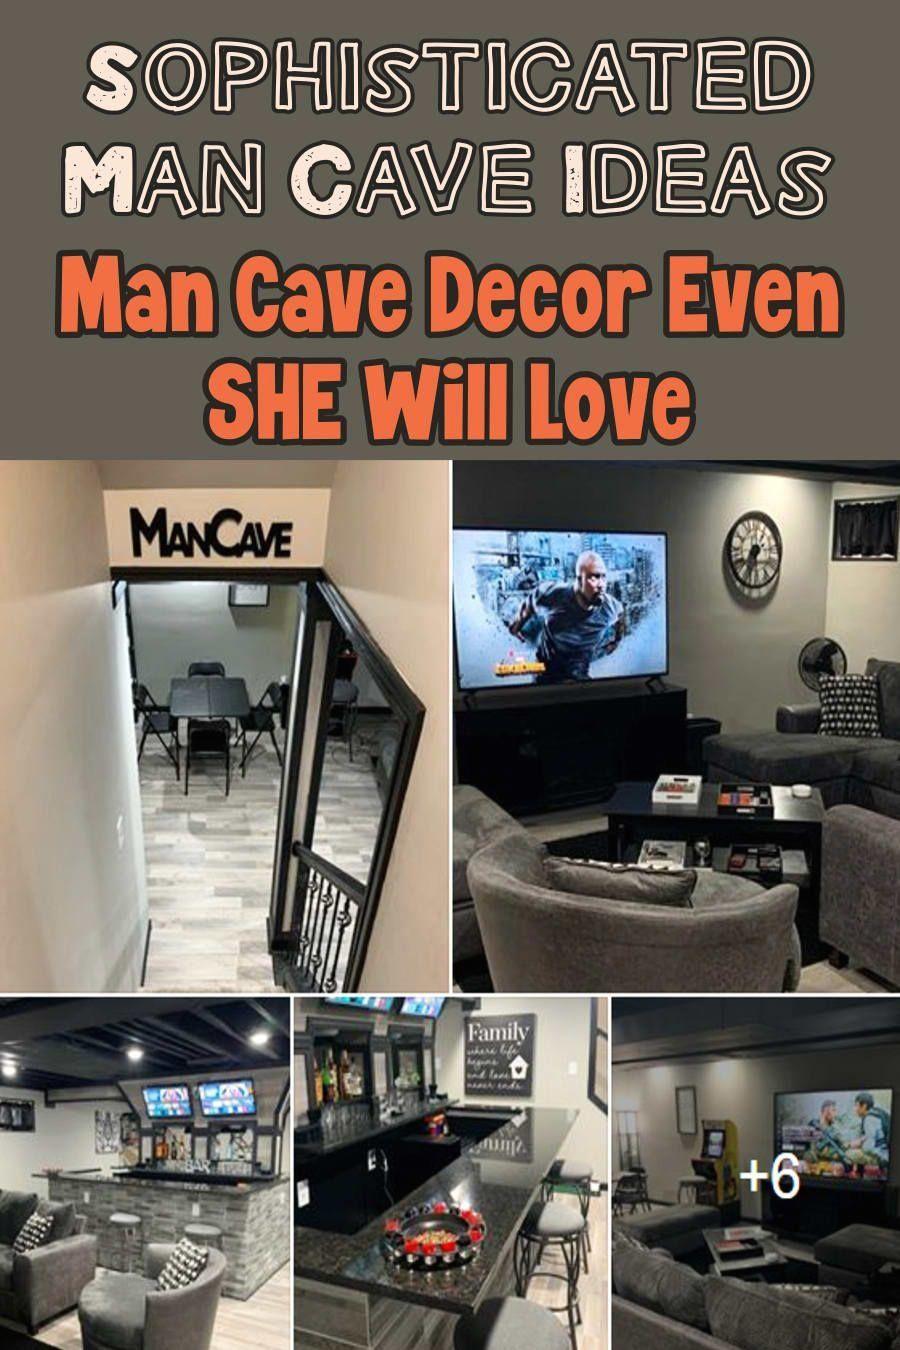 Man Cave Ideas Garage Man Cave Ideas On A Budget Clever Diy Ideas 1000 In 2020 Man Cave Bathroom Man Cave Man Cave Garage